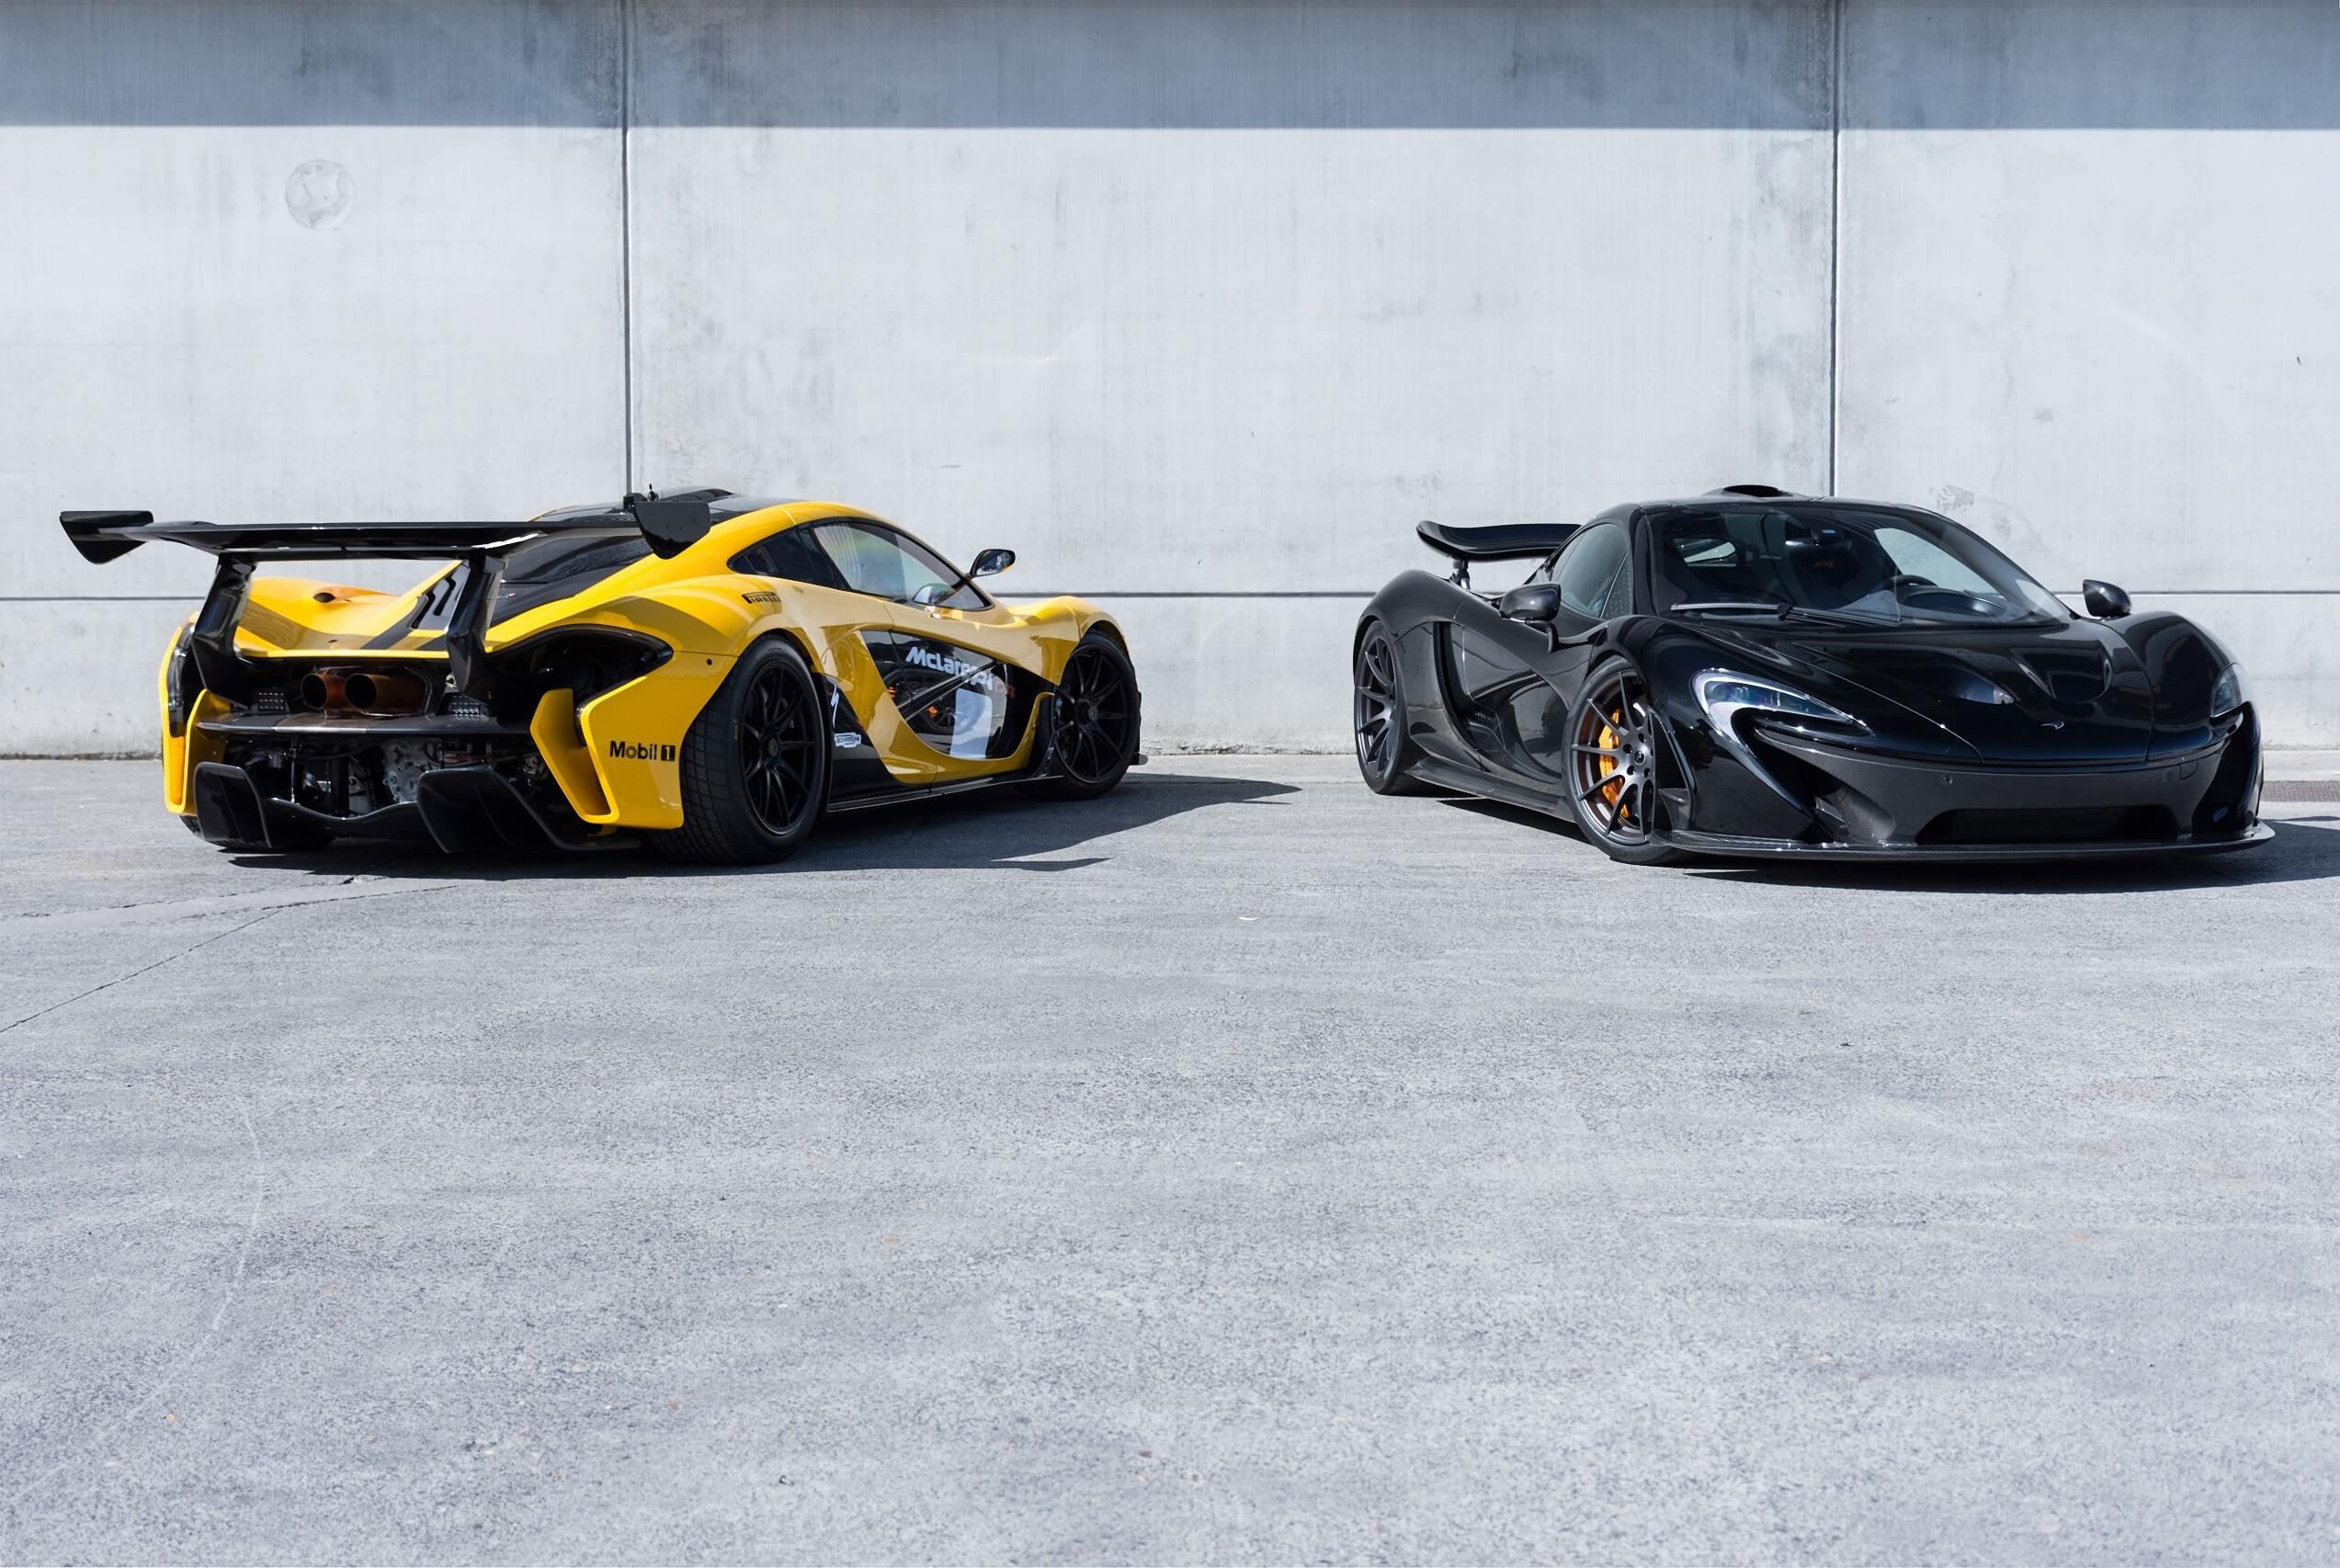 Street-legal-McLaren-P1-GTR-for-sale-28